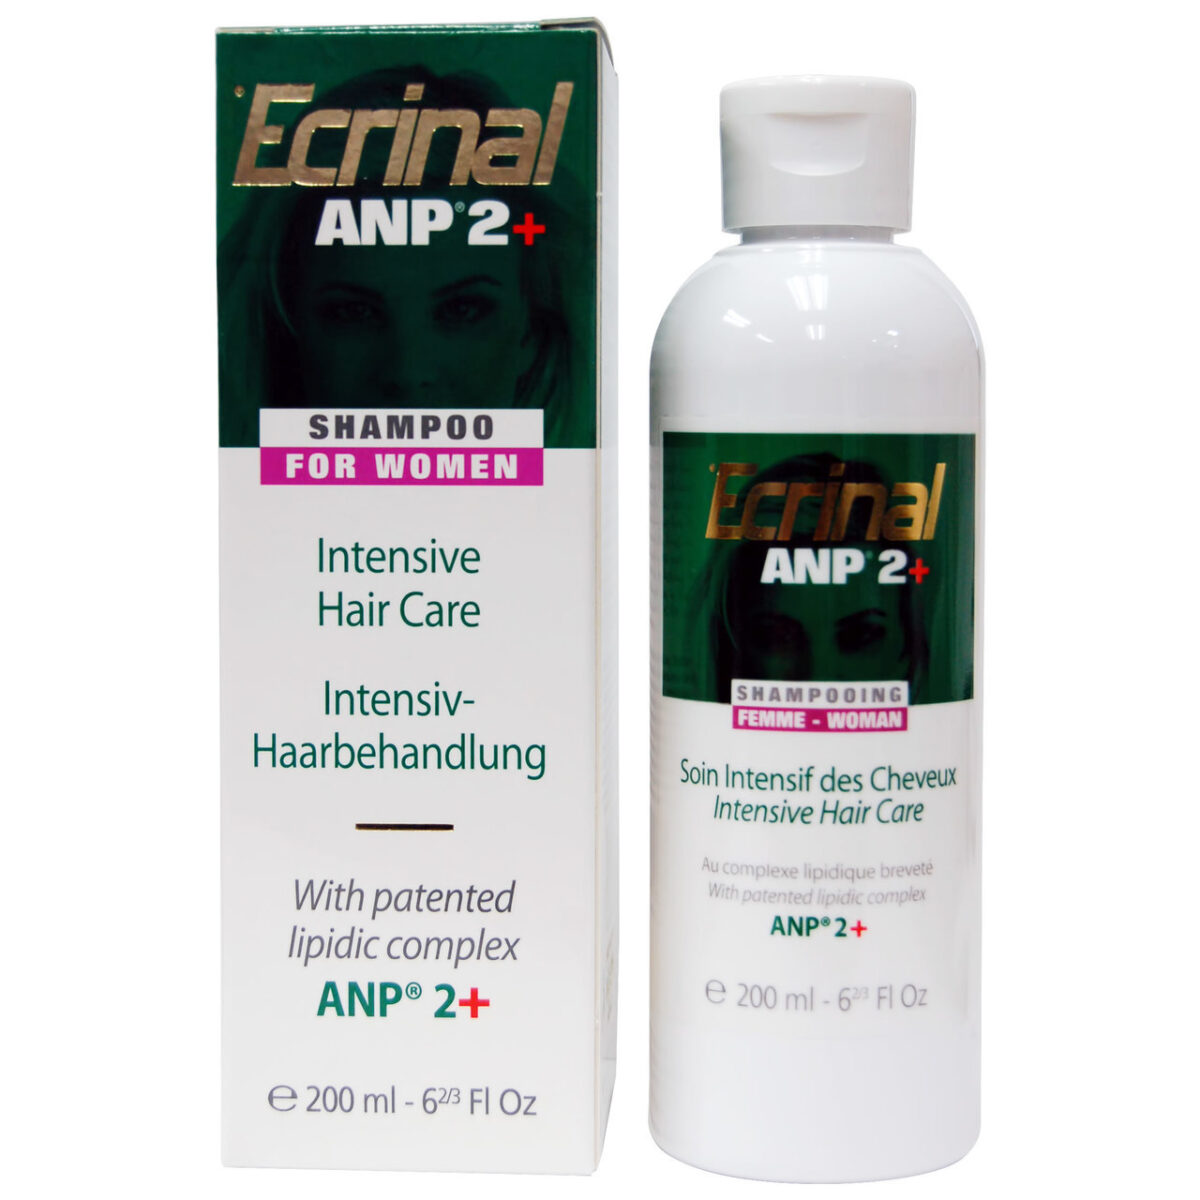 Ecrinal ANP 2 Plus Shampoo for Women 6.66 oz